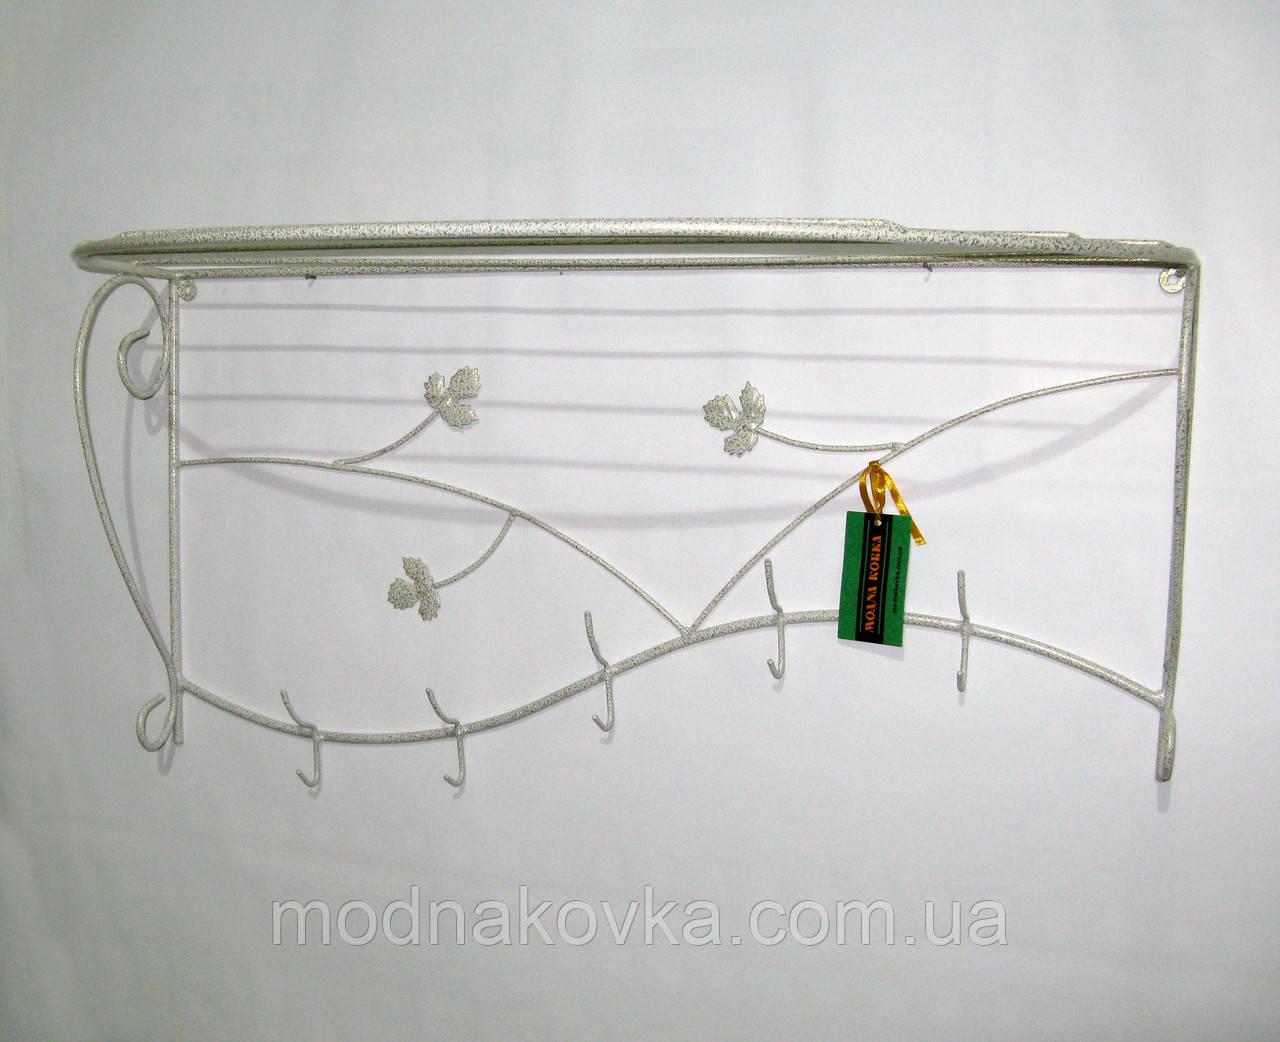 Вешалка кованая настенная 80 см, белая